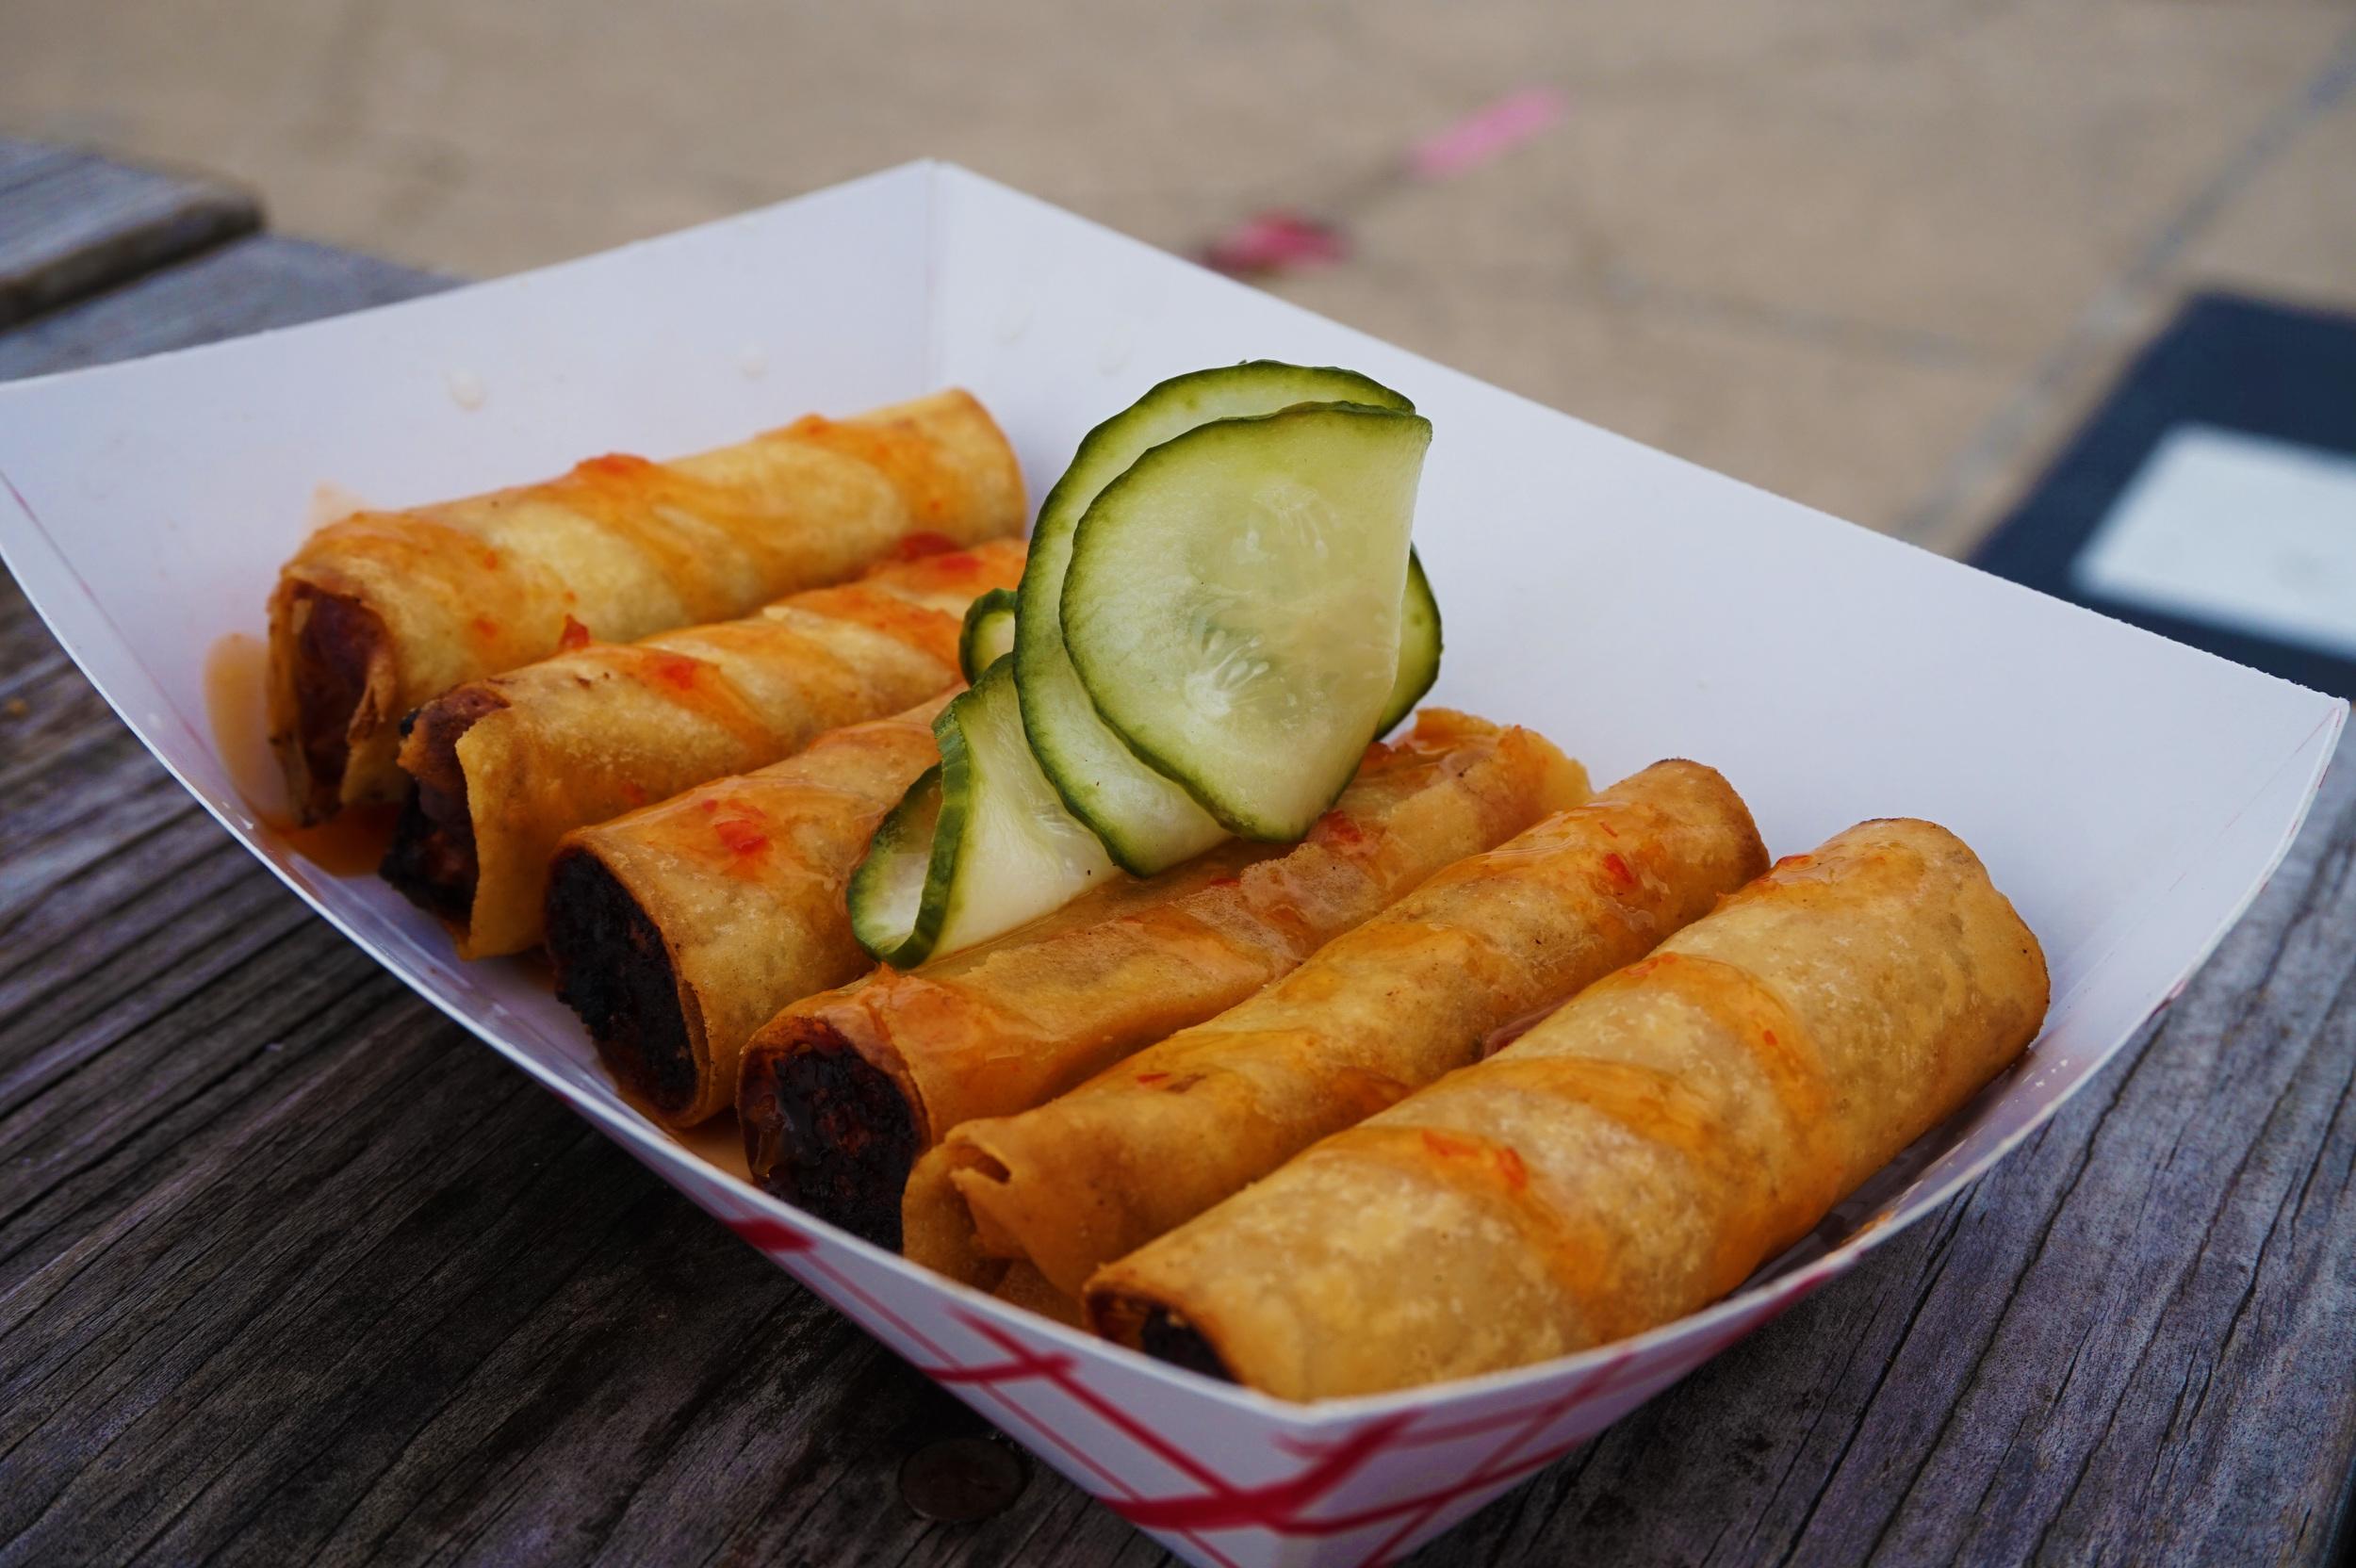 Some Filipino street food that Adrien got